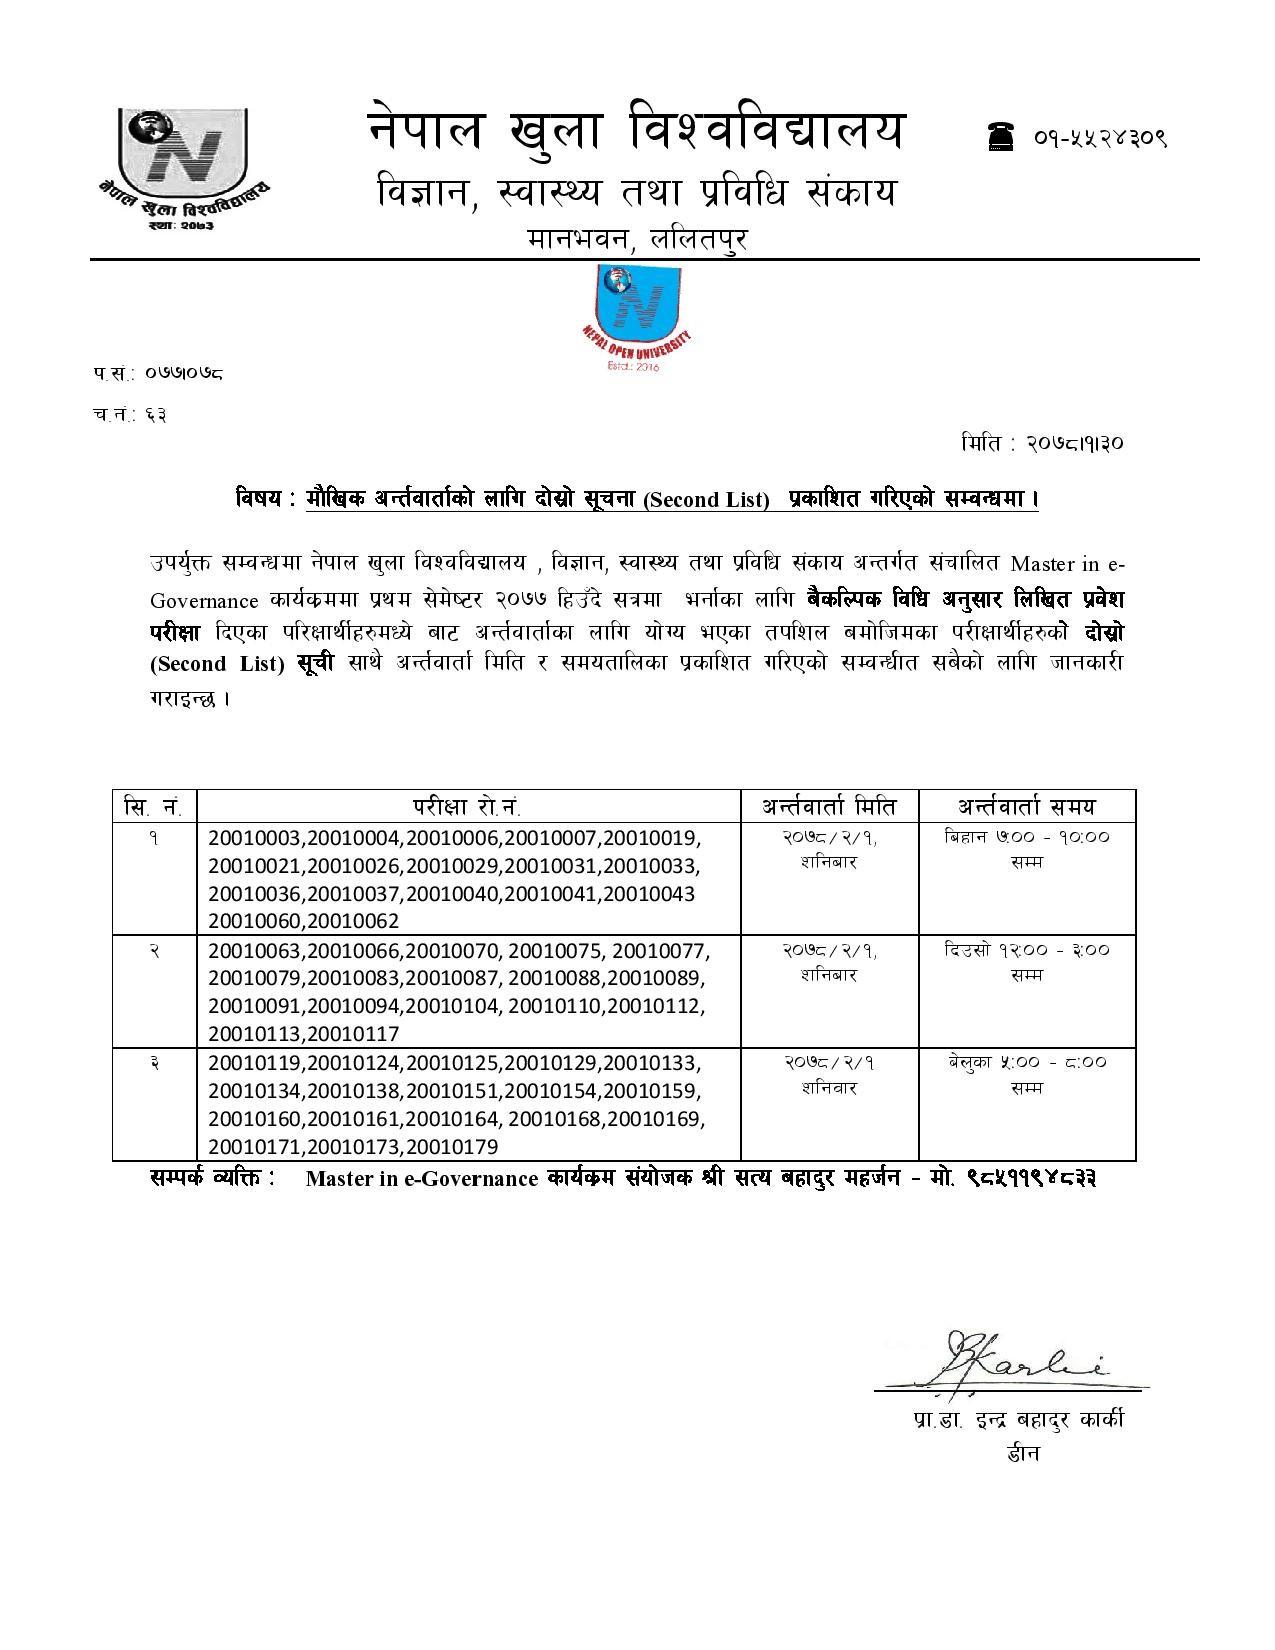 Notice regarding the written exam result of Master in e-Governance entrance- 2077 winter (2nd List)